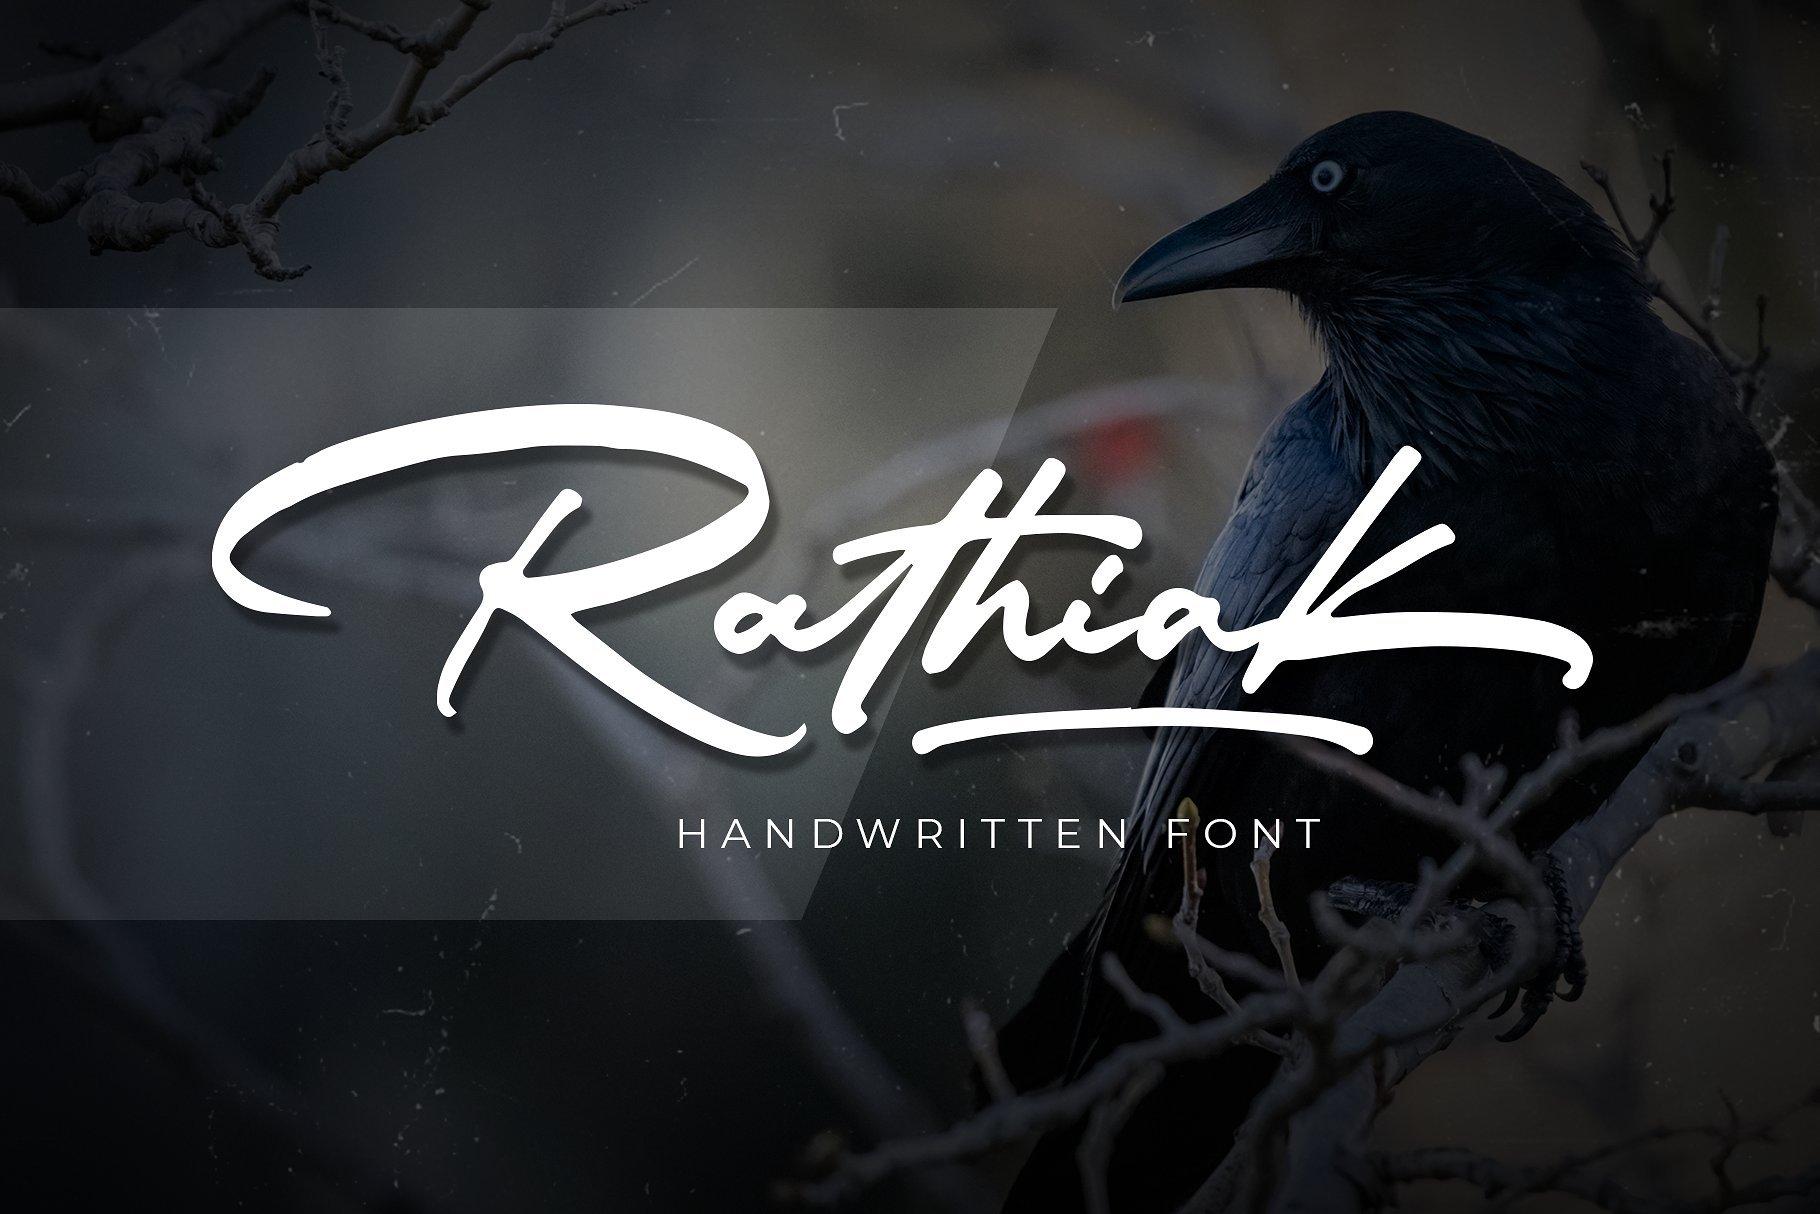 https://fontclarity.com/wp-content/uploads/2019/09/rathiak-handwritten-font-download-0.jpg Free Download